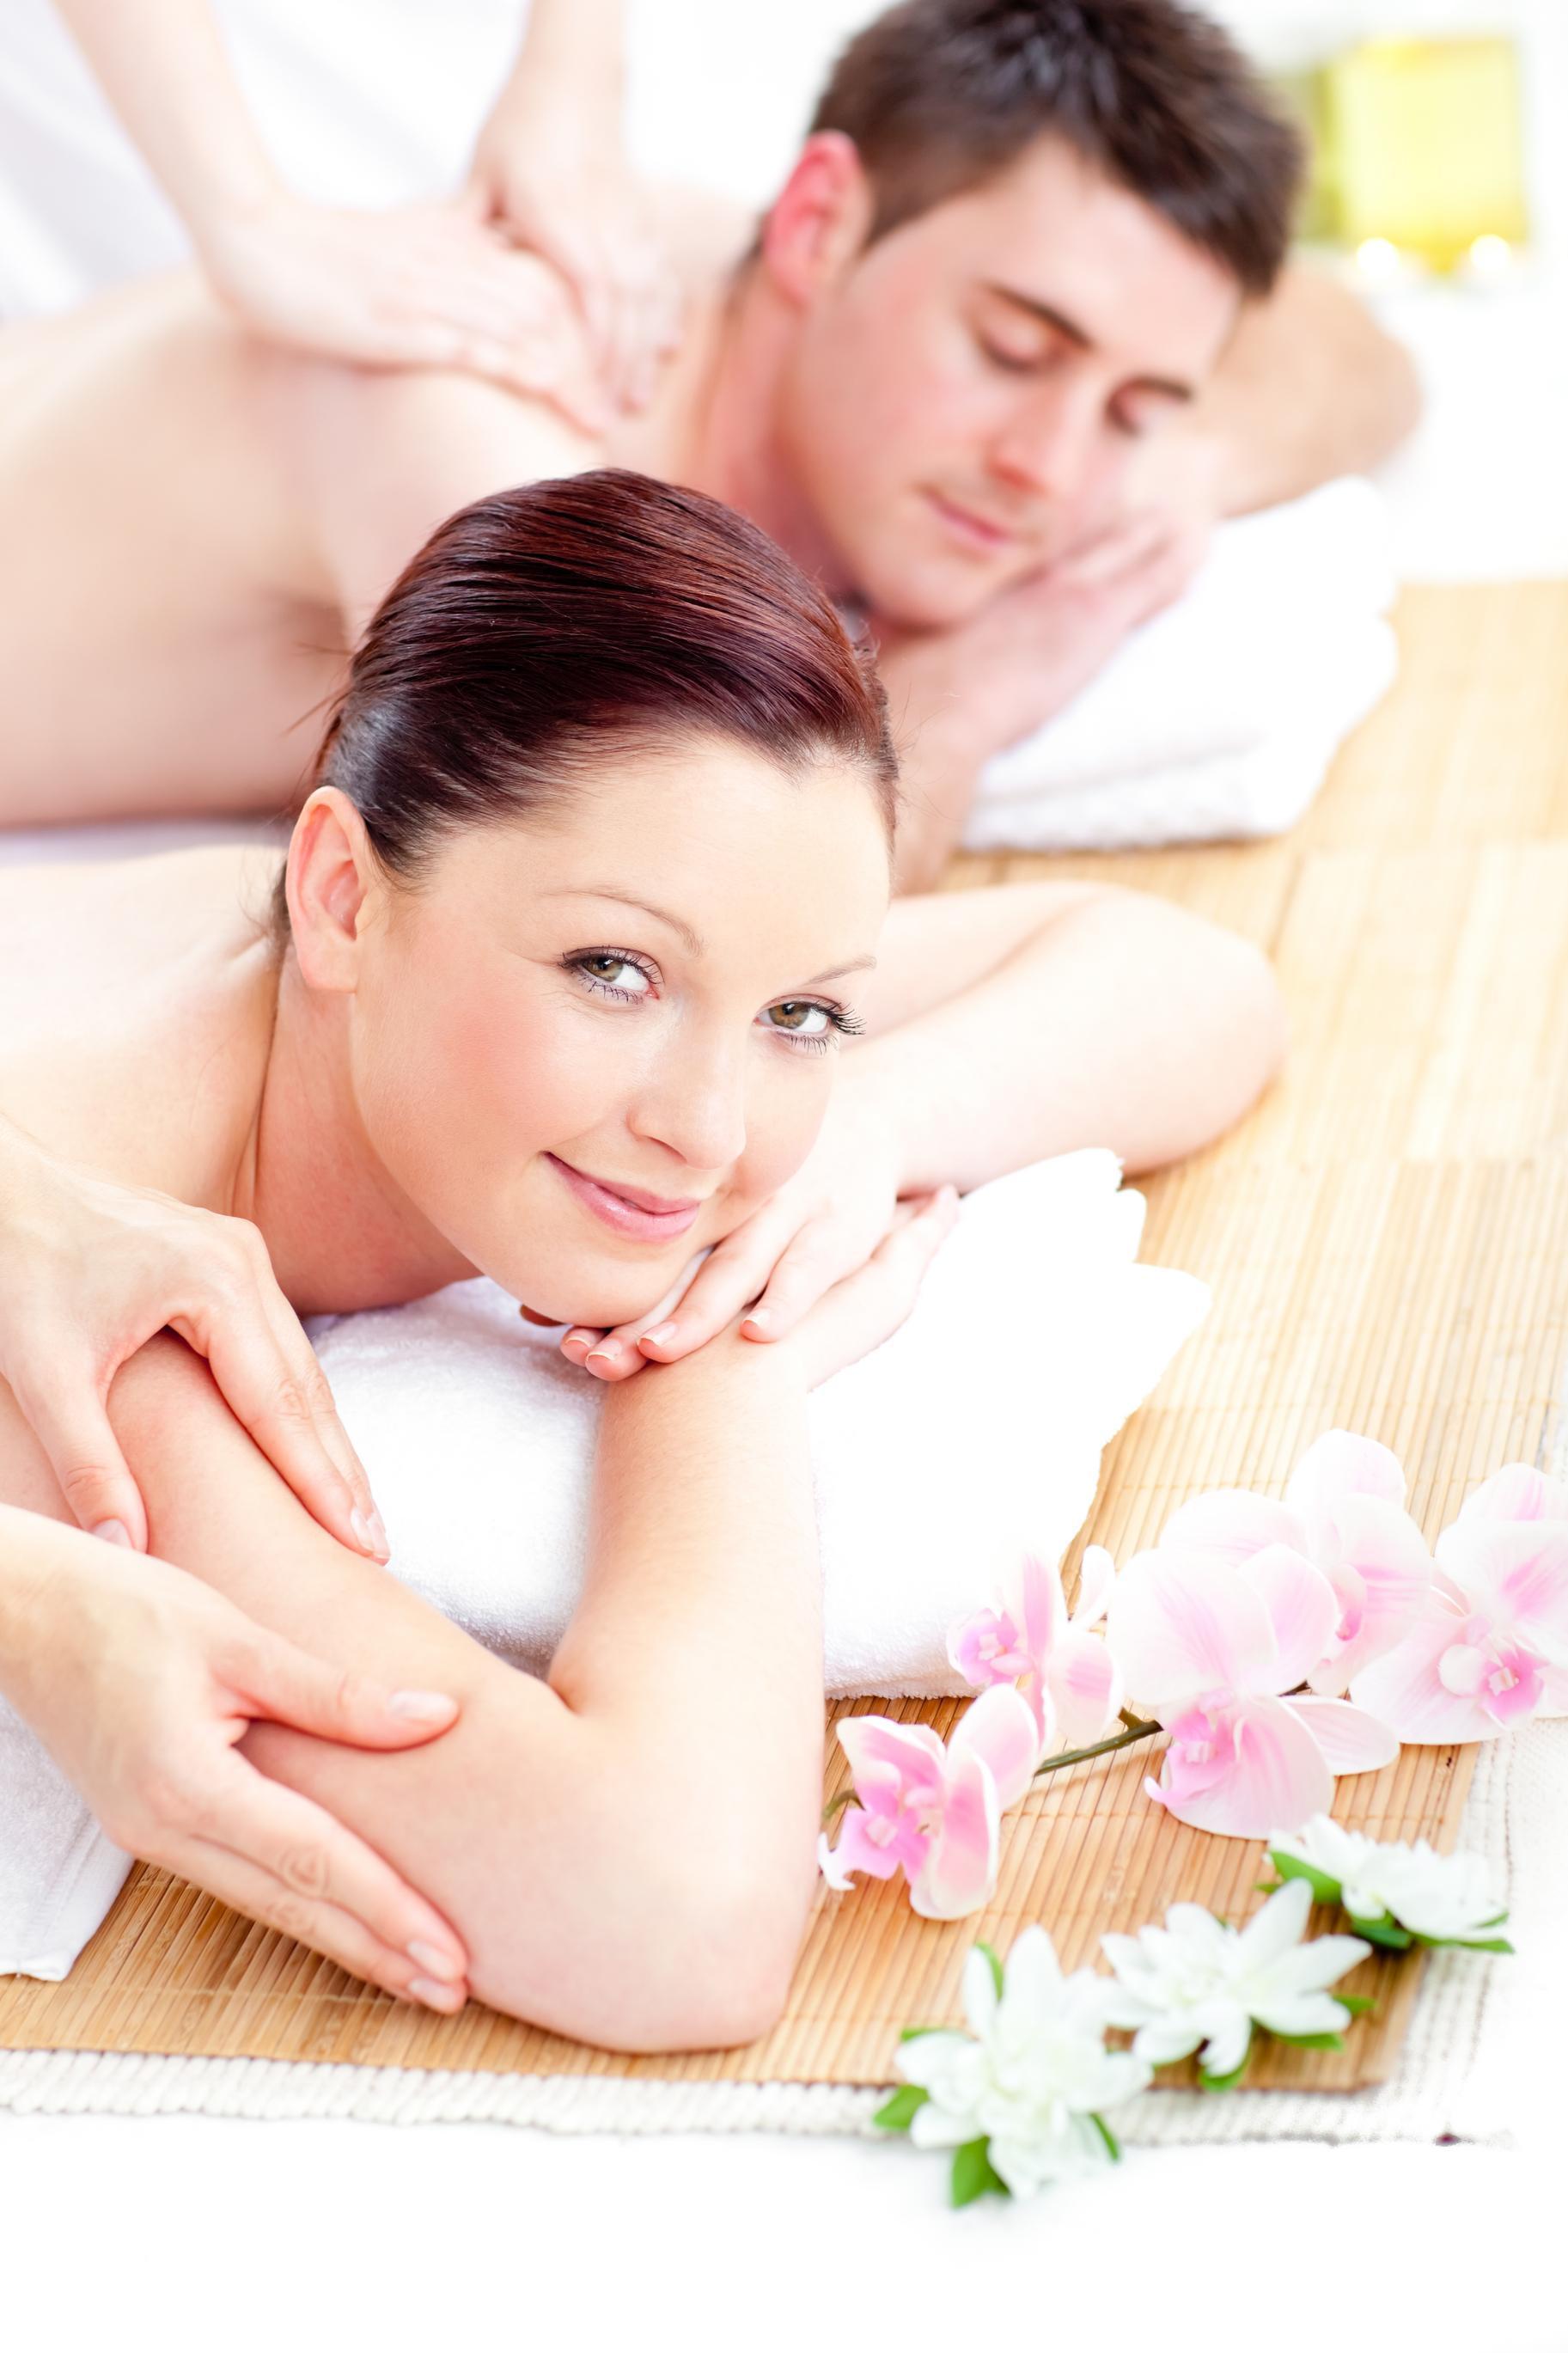 Is 4 hand massage worth it